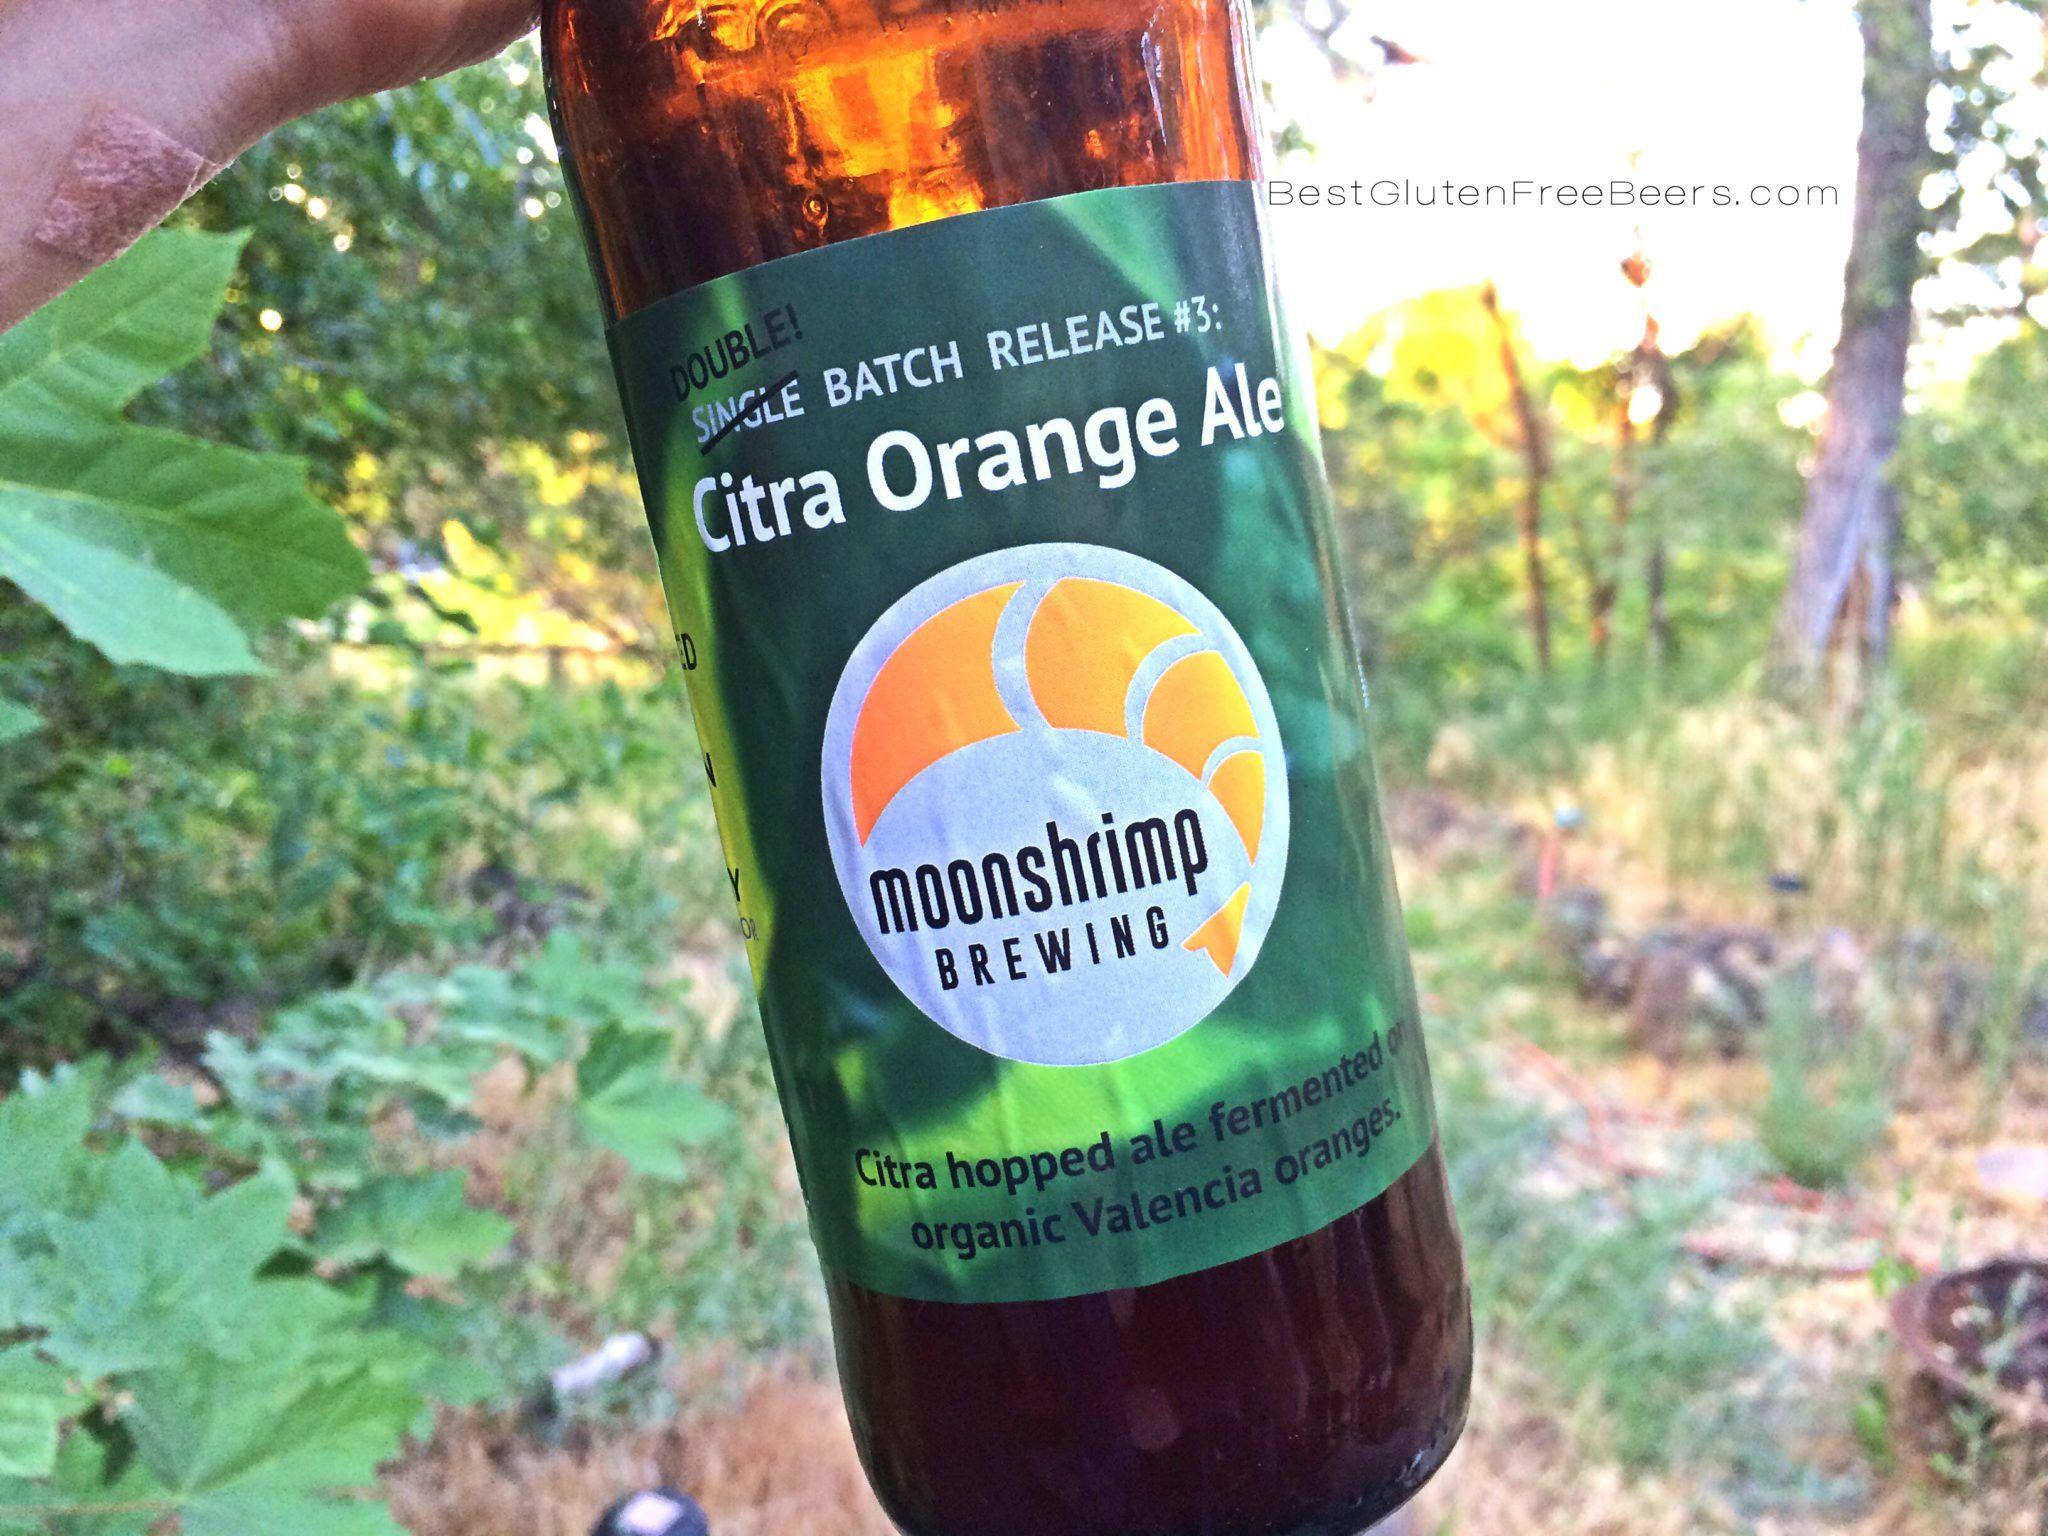 Moonshrimp Brewing Citra Orange Ale best gluten free beers review